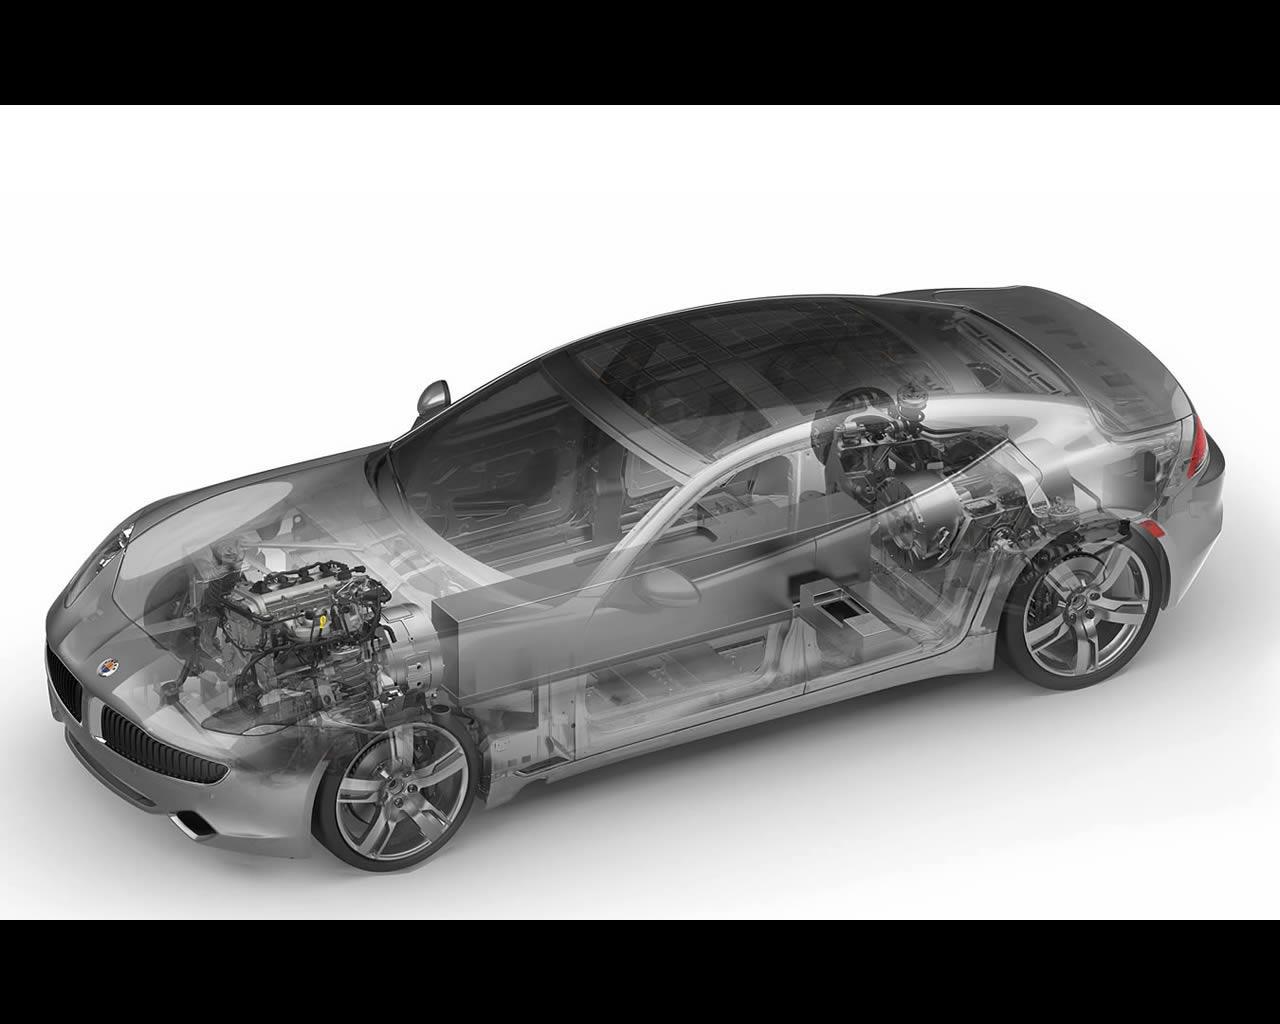 Fisker Karma Plug In Hybrid Electric Vehicle With Range